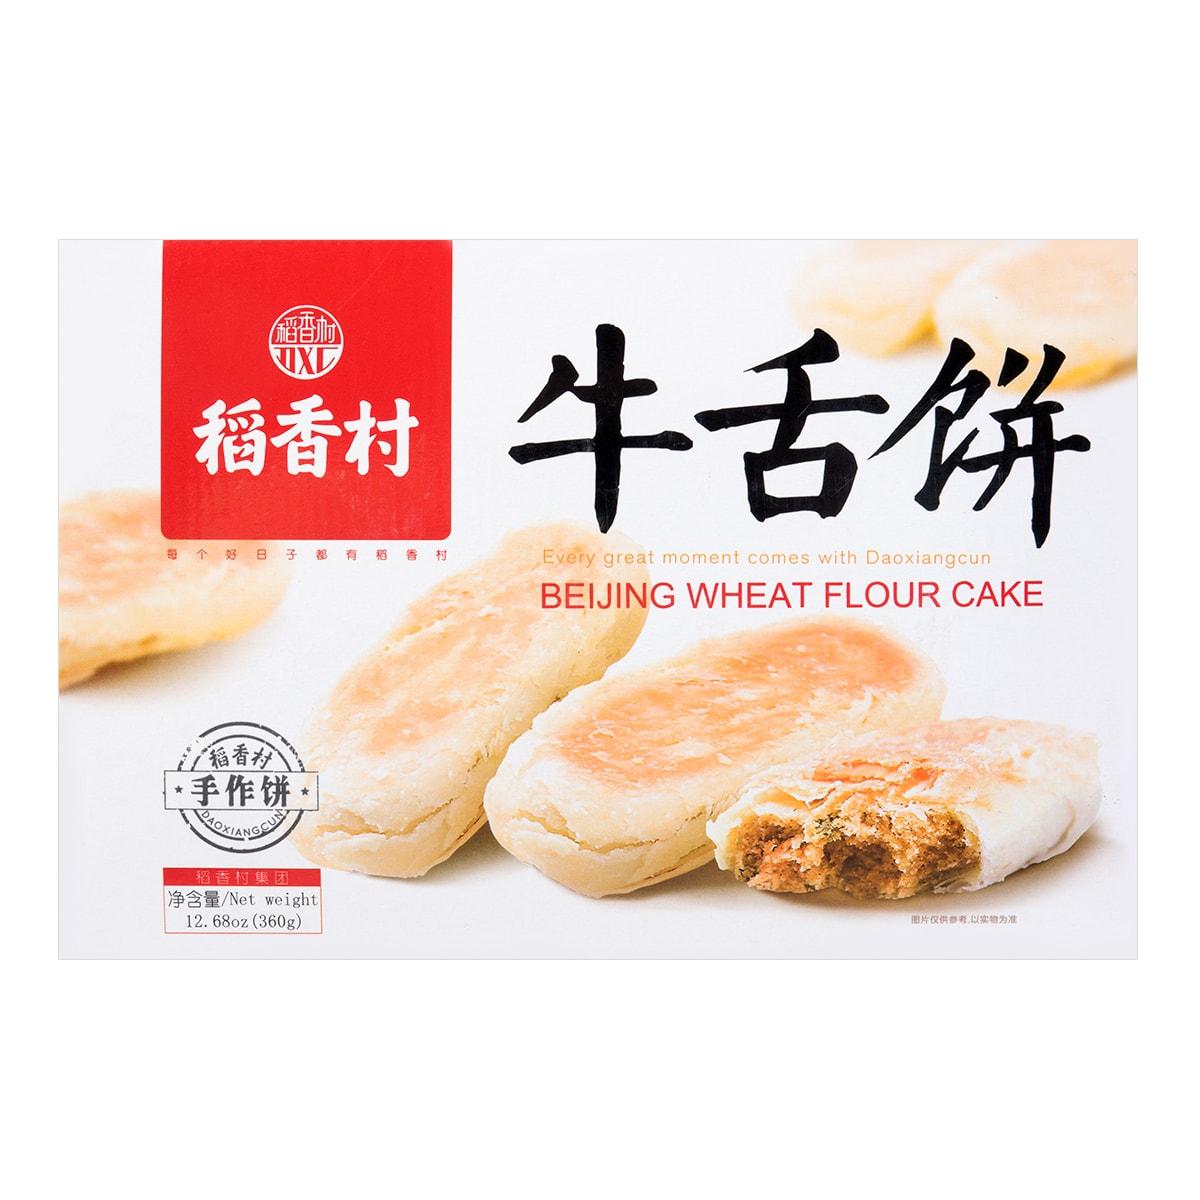 稻香村 牛舌饼 360g